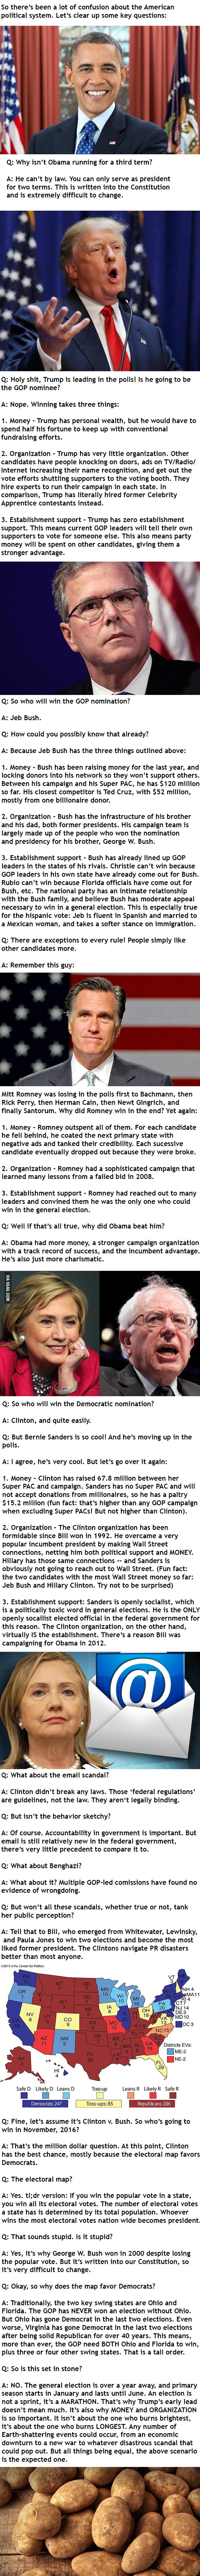 9GAG American Politics Primer